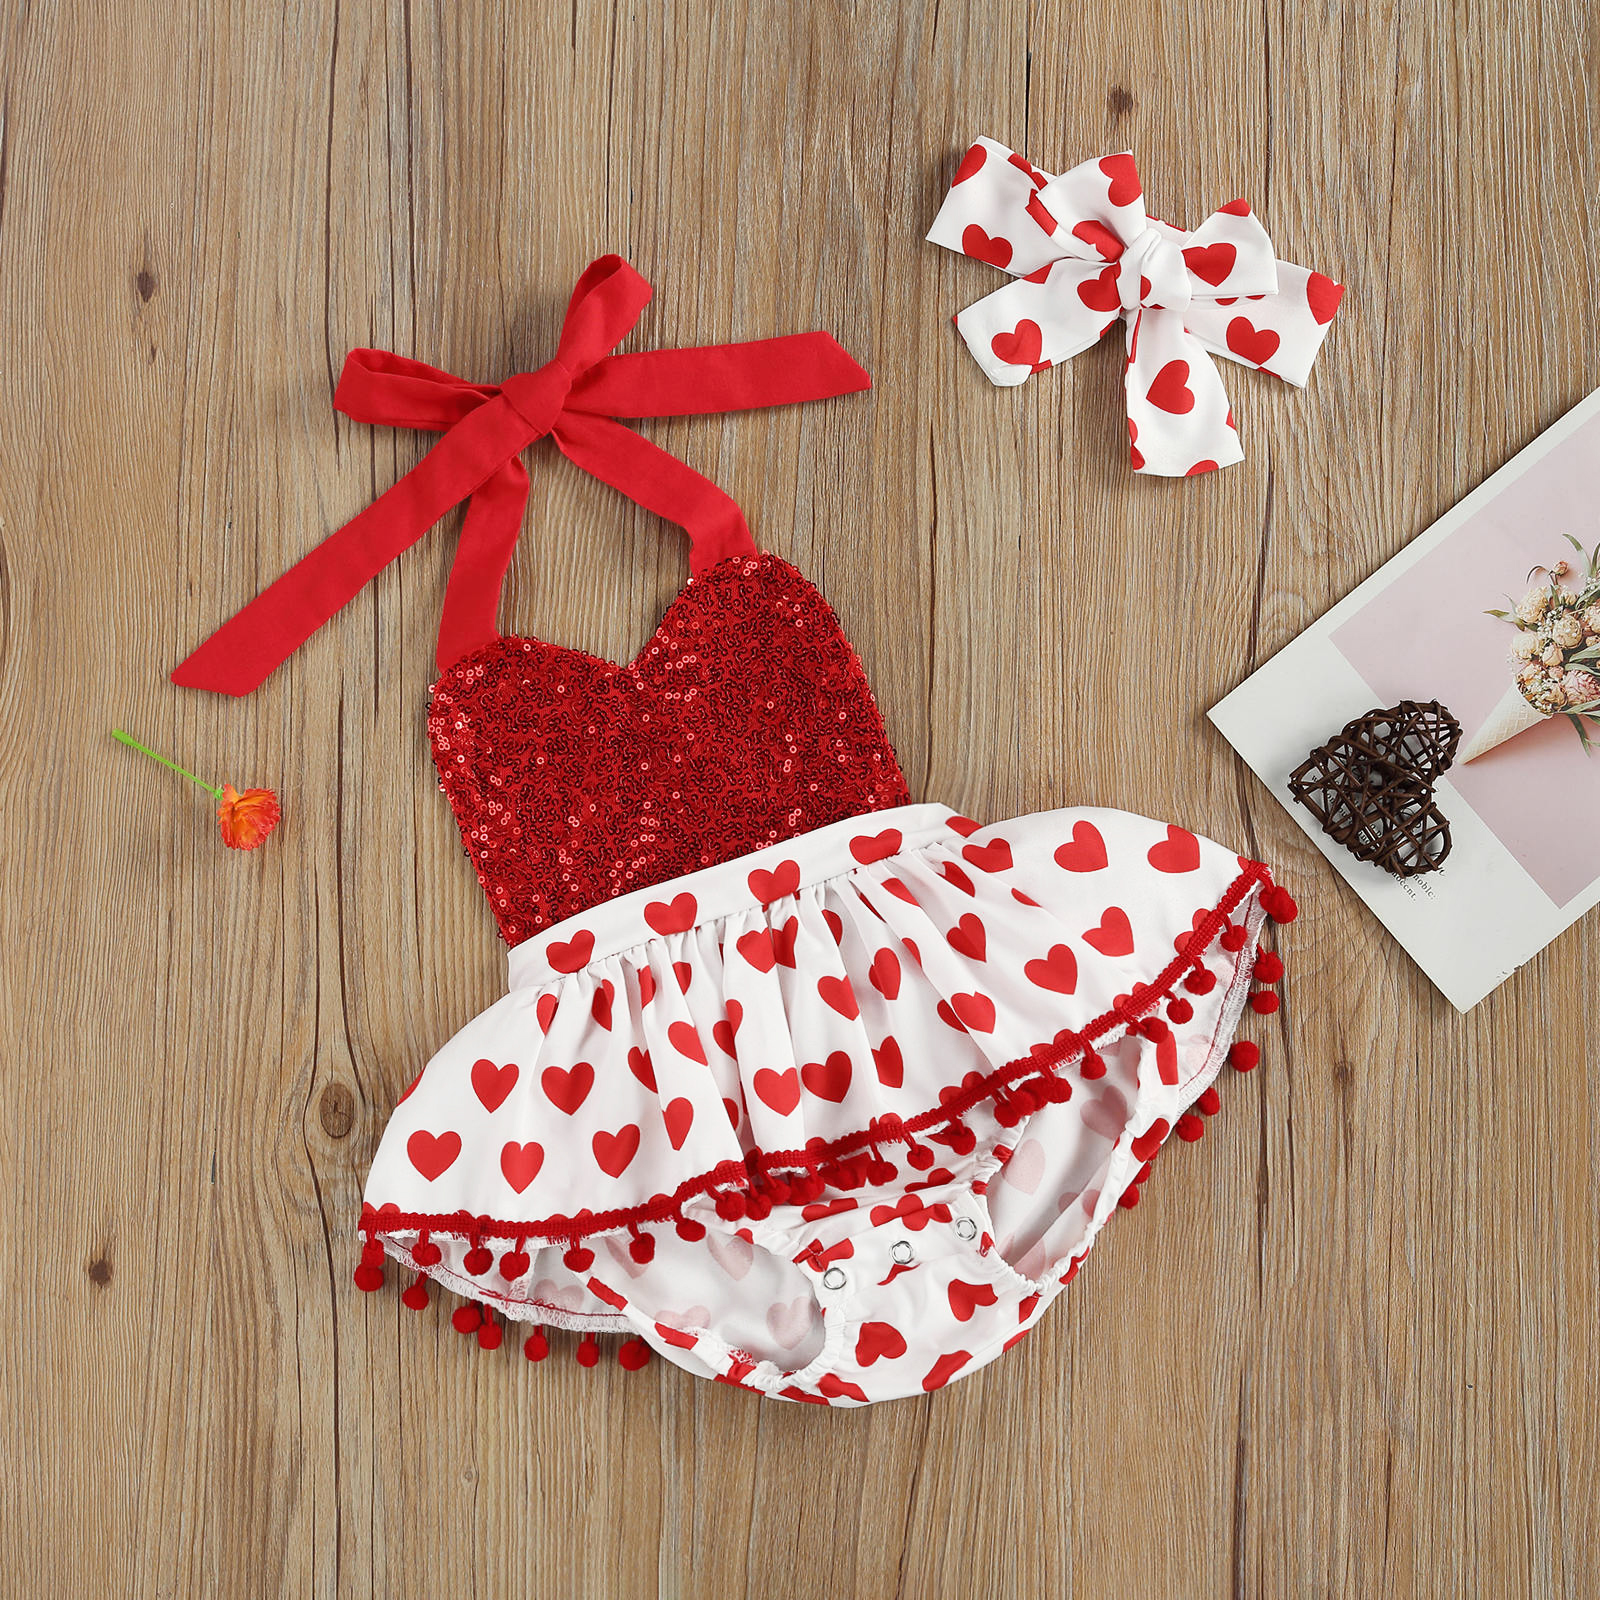 2pcs 0-24m  Newborn Baby Girls Clothes Set Outfits,  Sleeveless Love Pattern  V-Neck Pompom Sequin Halter Romper + Headband Set